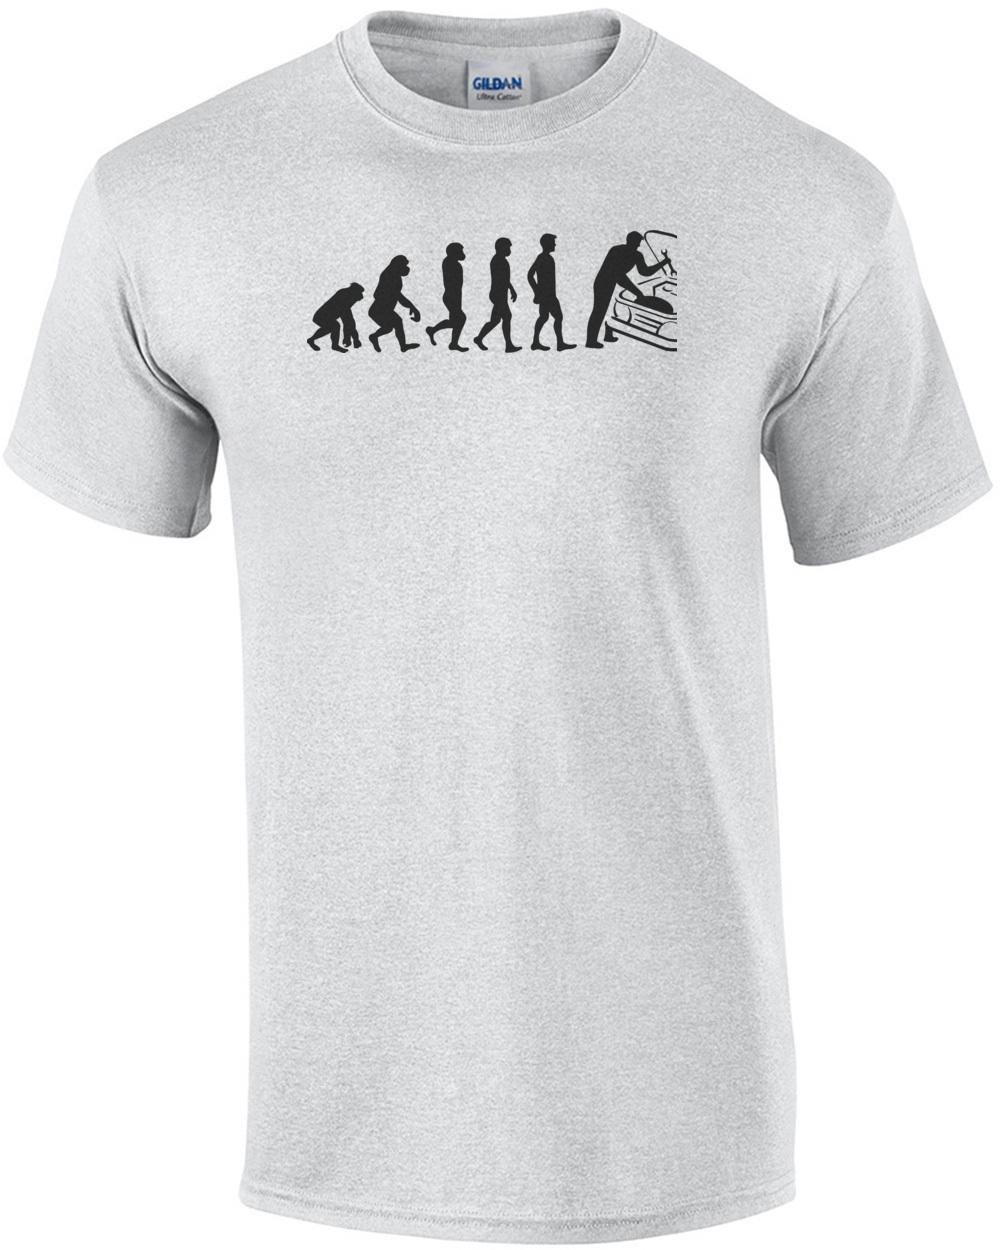 8aabe3e8e Mechanic Evolution - Funny Mechanic T-Shirt